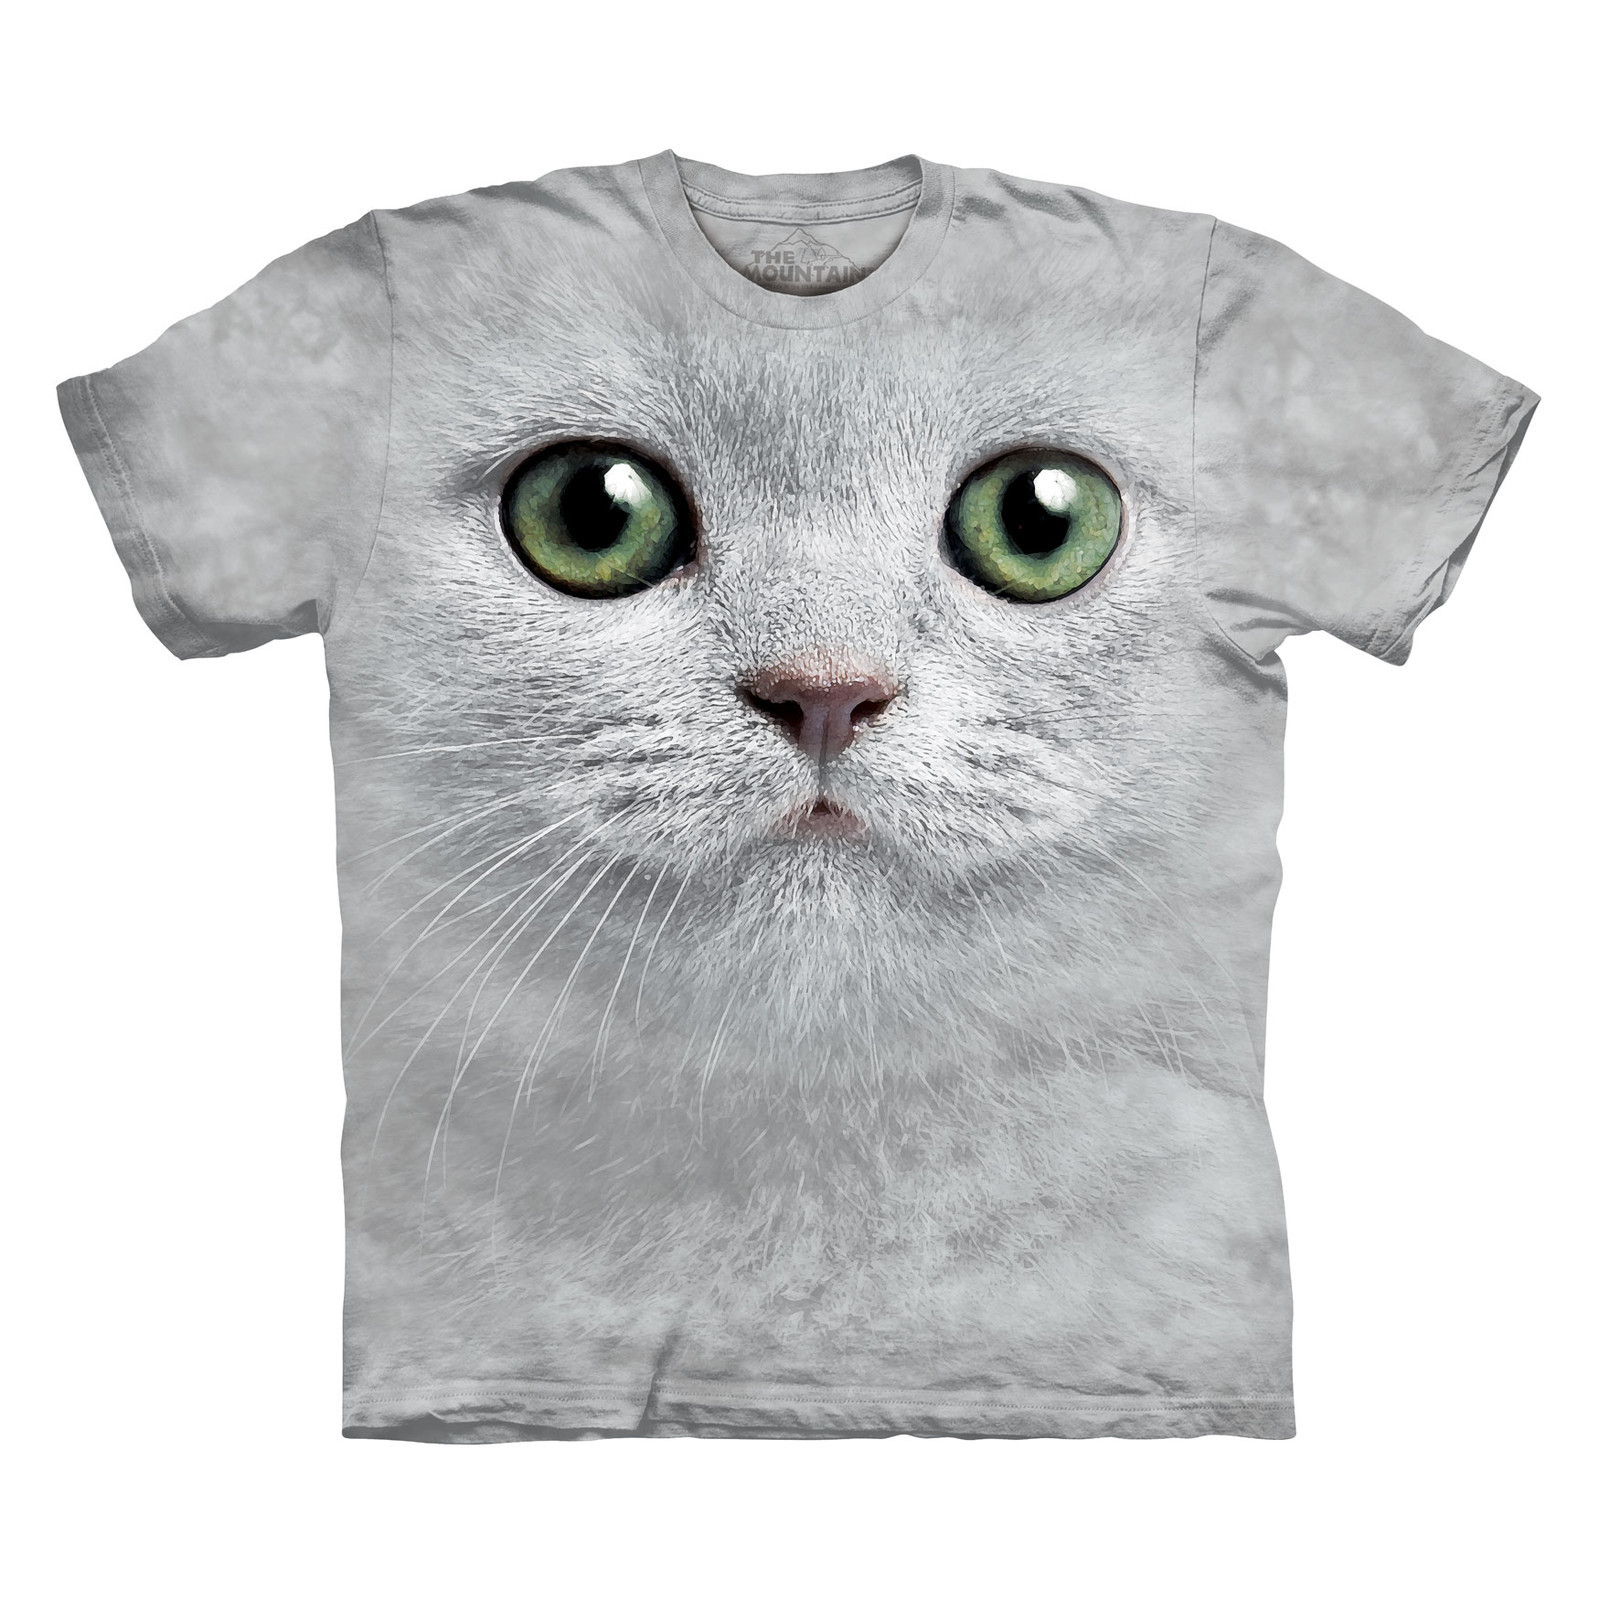 MOUNTAIN GREEN EYES FACE SIZE LARGE CUTE WHITE KITTY CAT KITTEN T